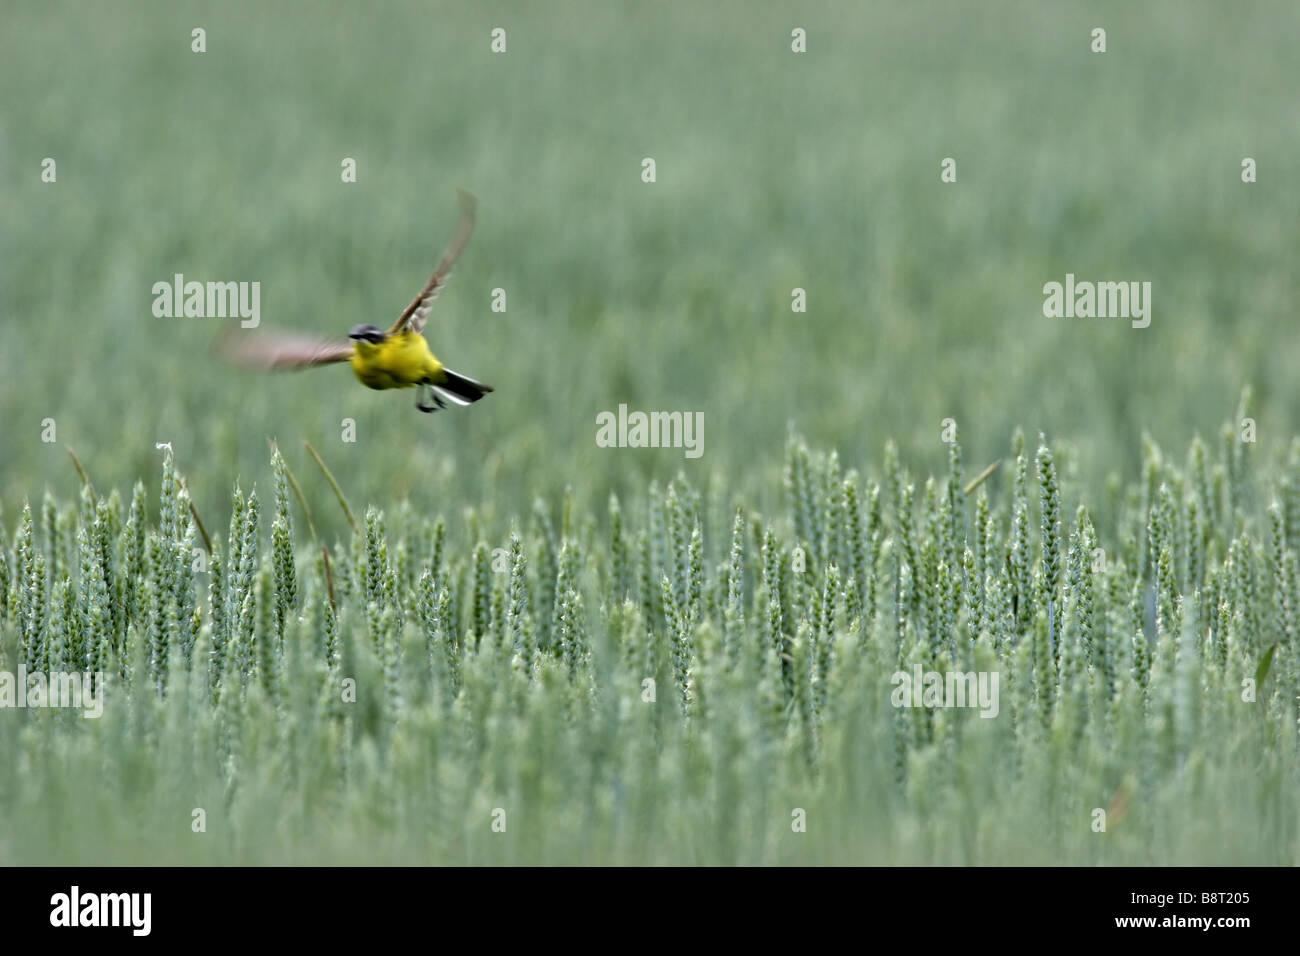 Blue-headed Wagtail, Yellow Wagtail (Motacilla flava flava), flying over grain field, Germany, Rhineland-Palatinate - Stock Image